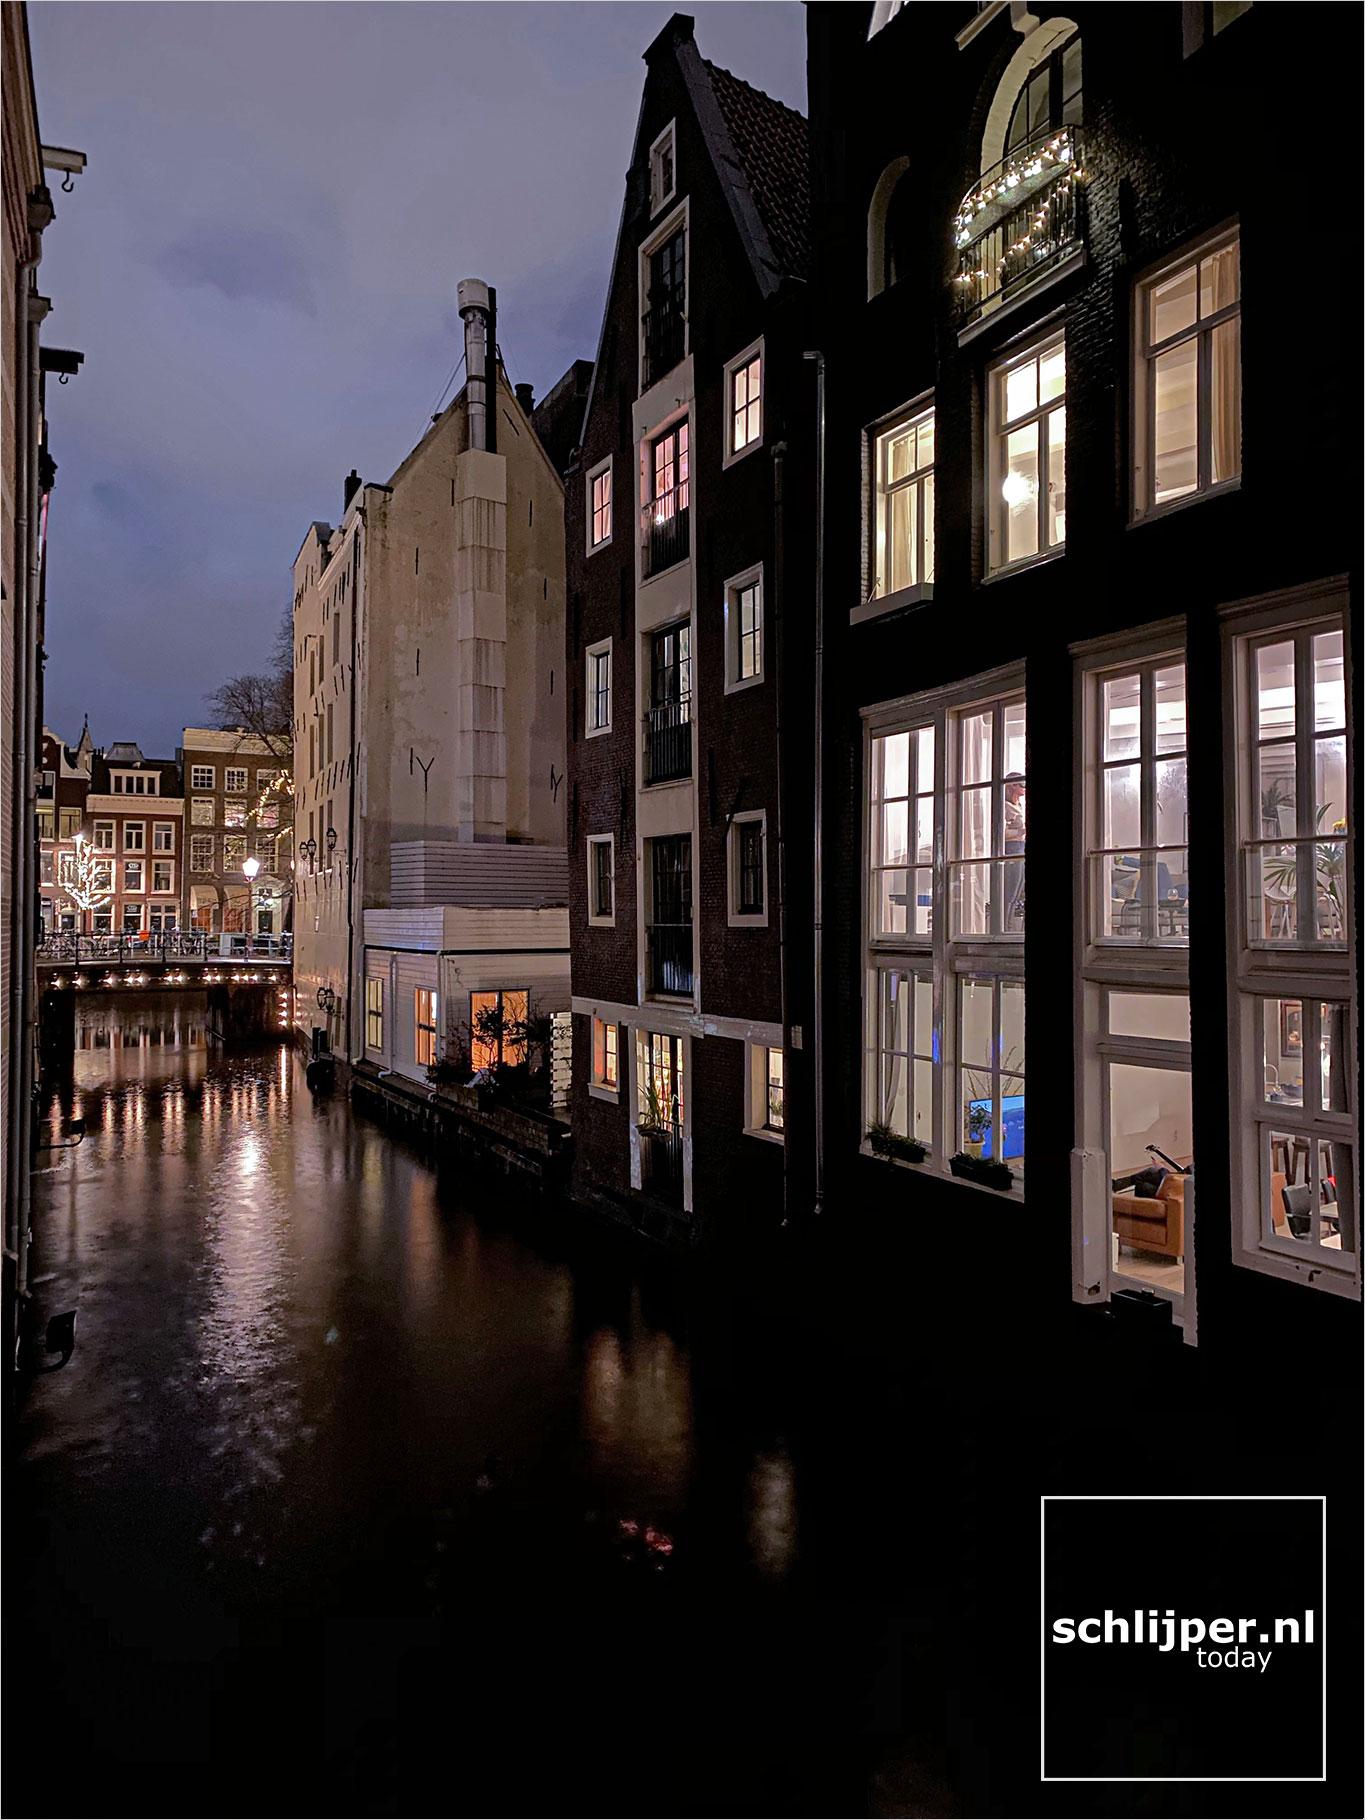 The Netherlands, Amsterdam, 29 december 2020